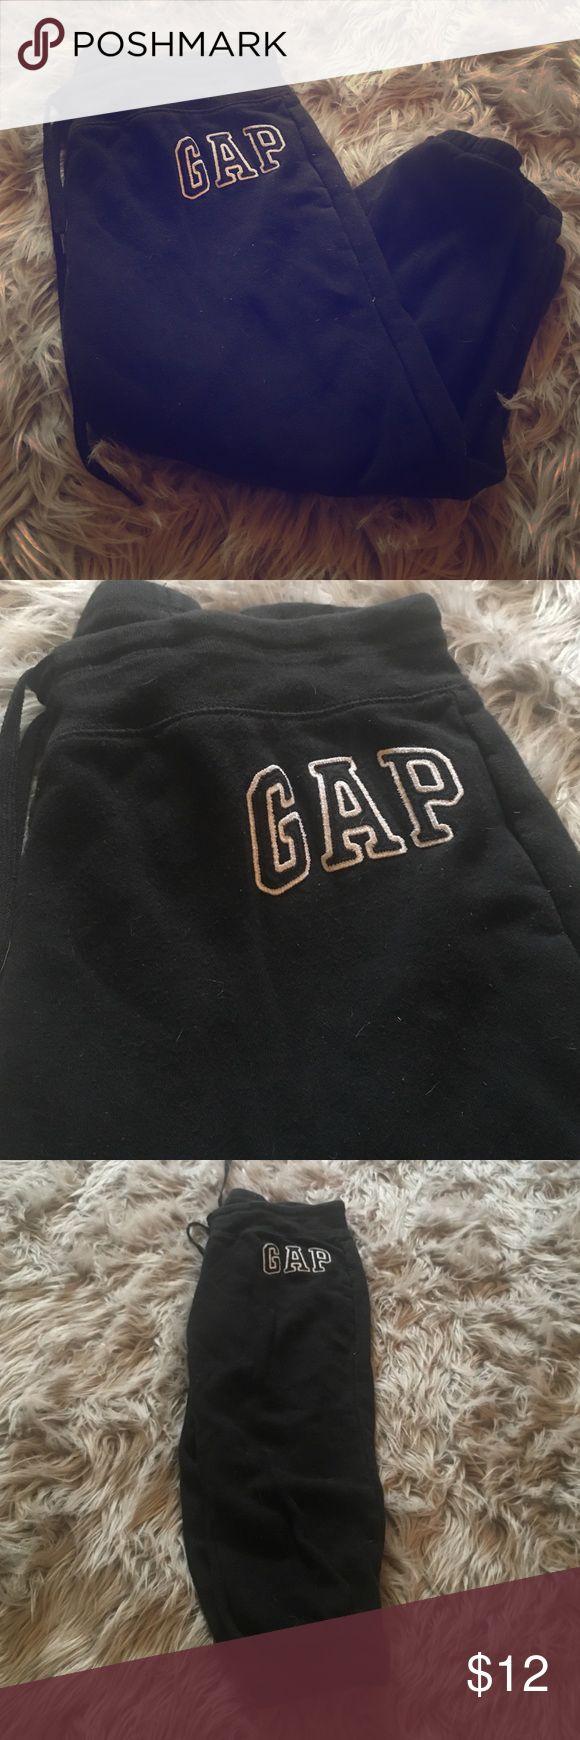 GAP women's small capri sweat pants Women's GAP size small black Capri sweat pants with white lettering. Gently worn and smoke free home. GAP Pants Capris